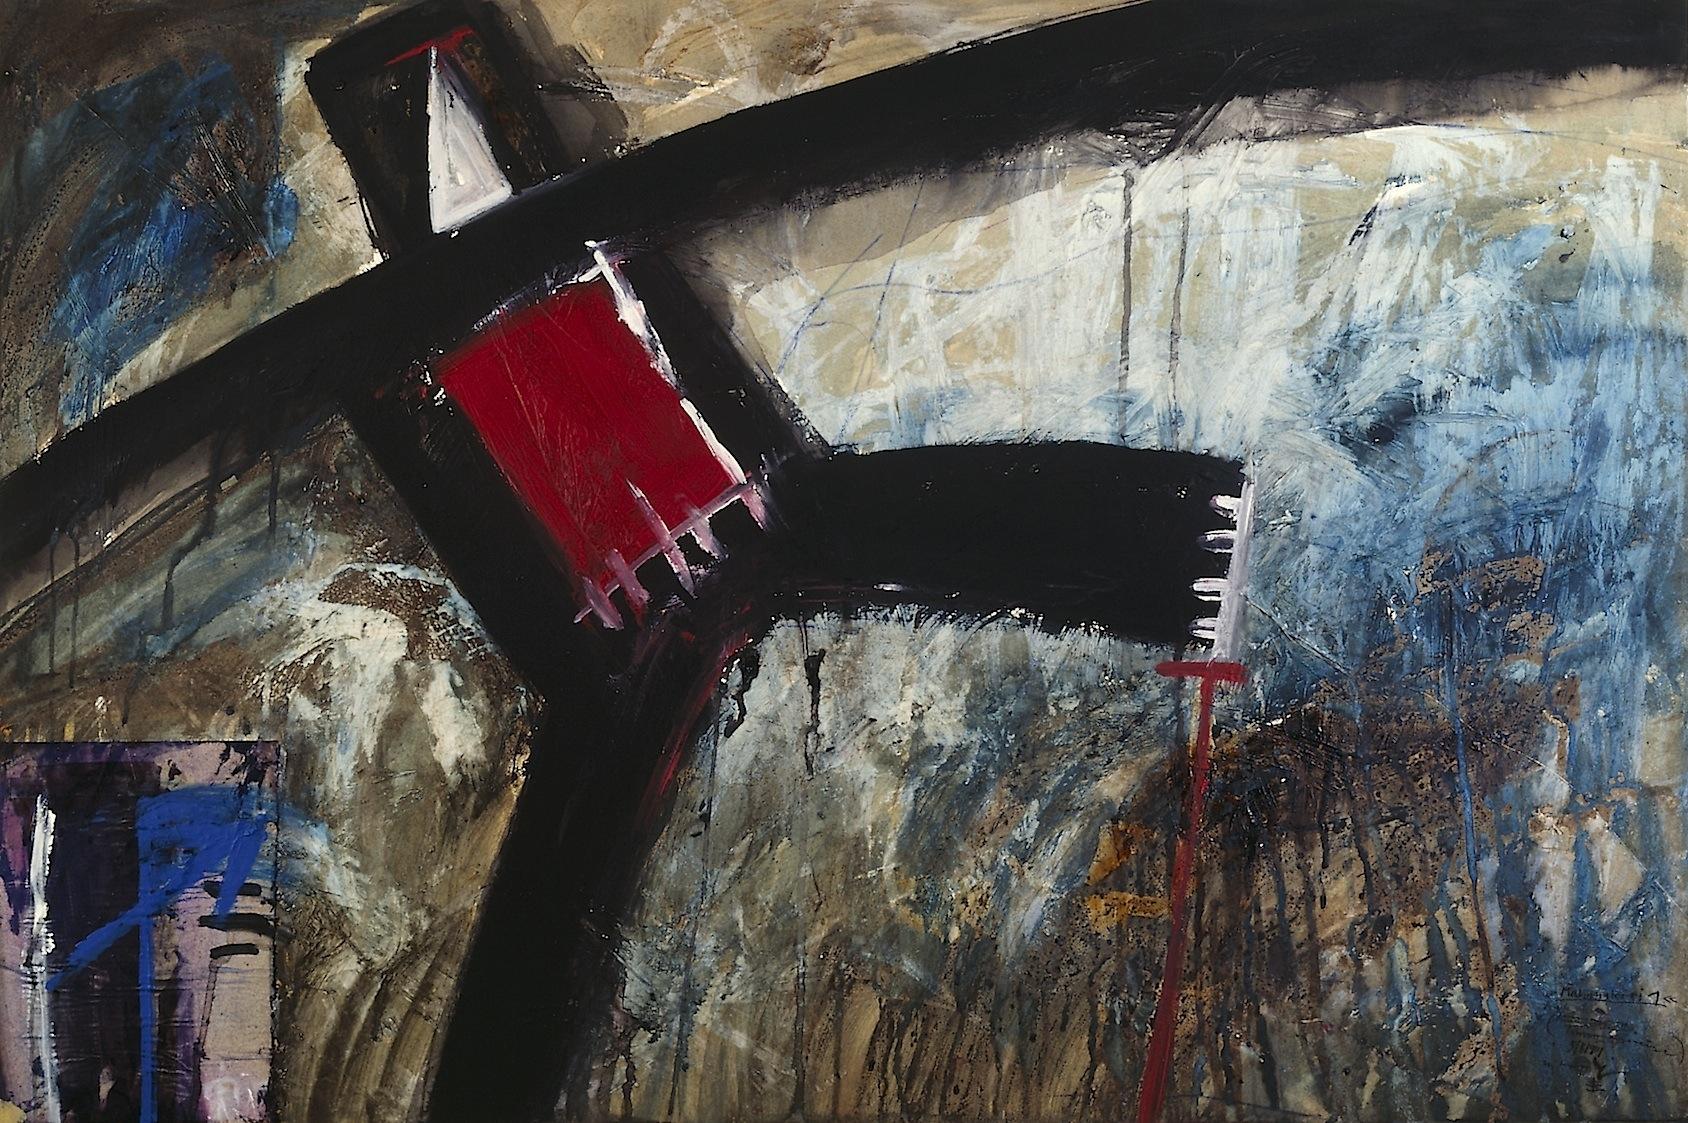 MahnmalereiEins1991